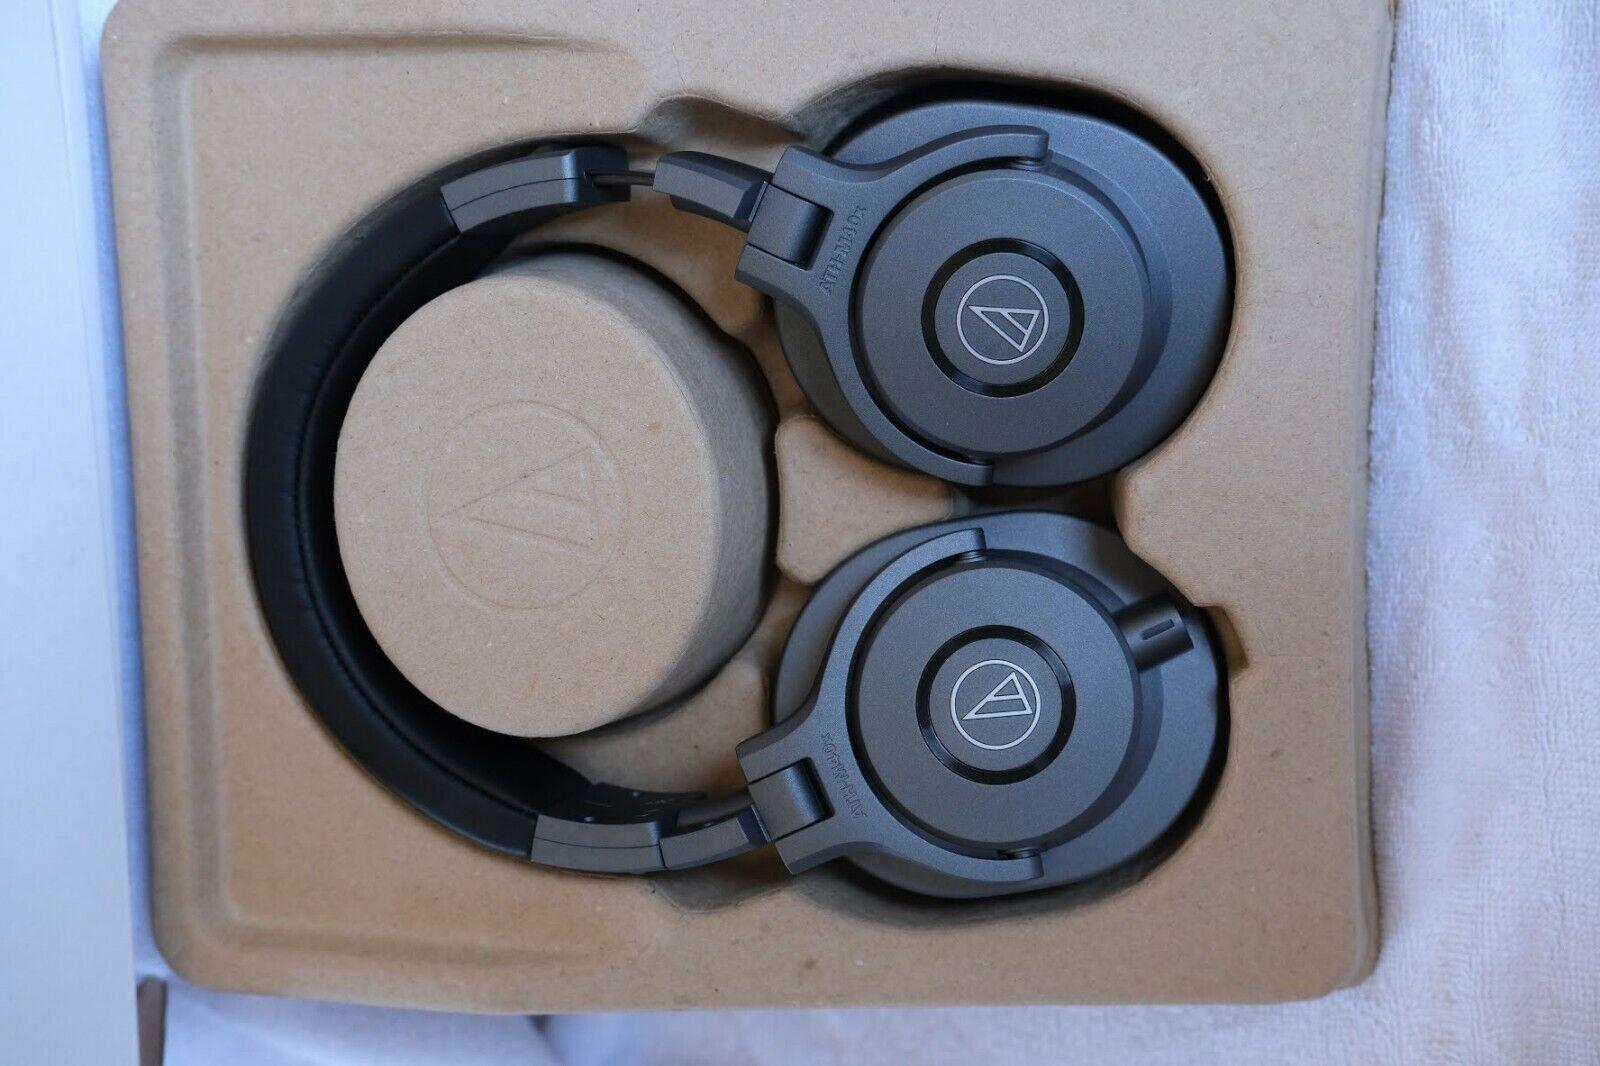 Audio-Technica ATH-M40x Over-Ear Headphones - Limited Editio